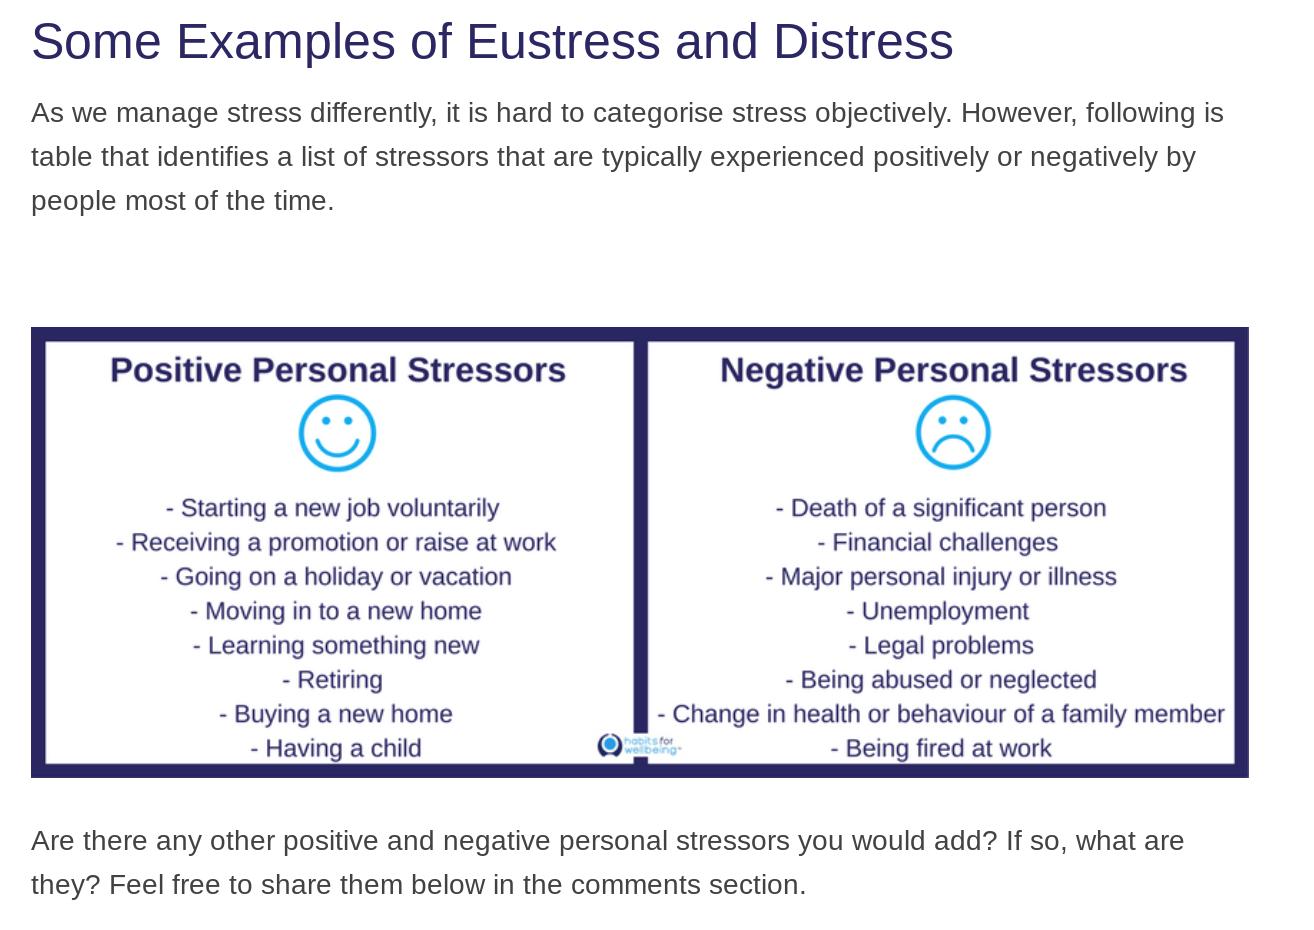 https://www.habitsforwellbeing.com/eustress-vs-distress/